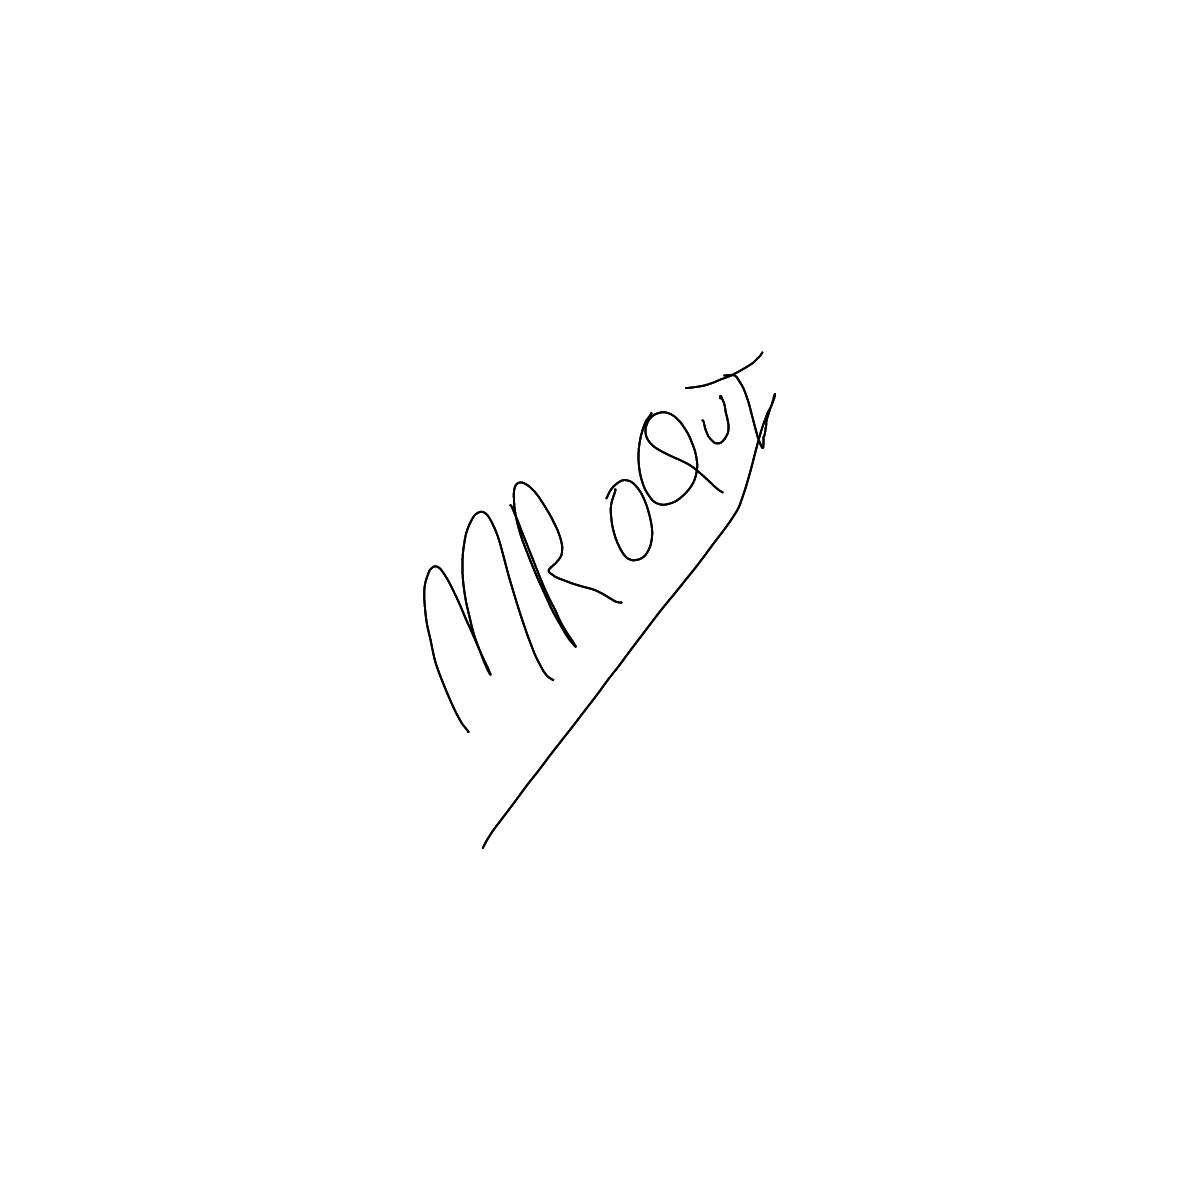 BAAAM drawing#24702 lat:29.6764183044433600lng: -9.7207965850830080